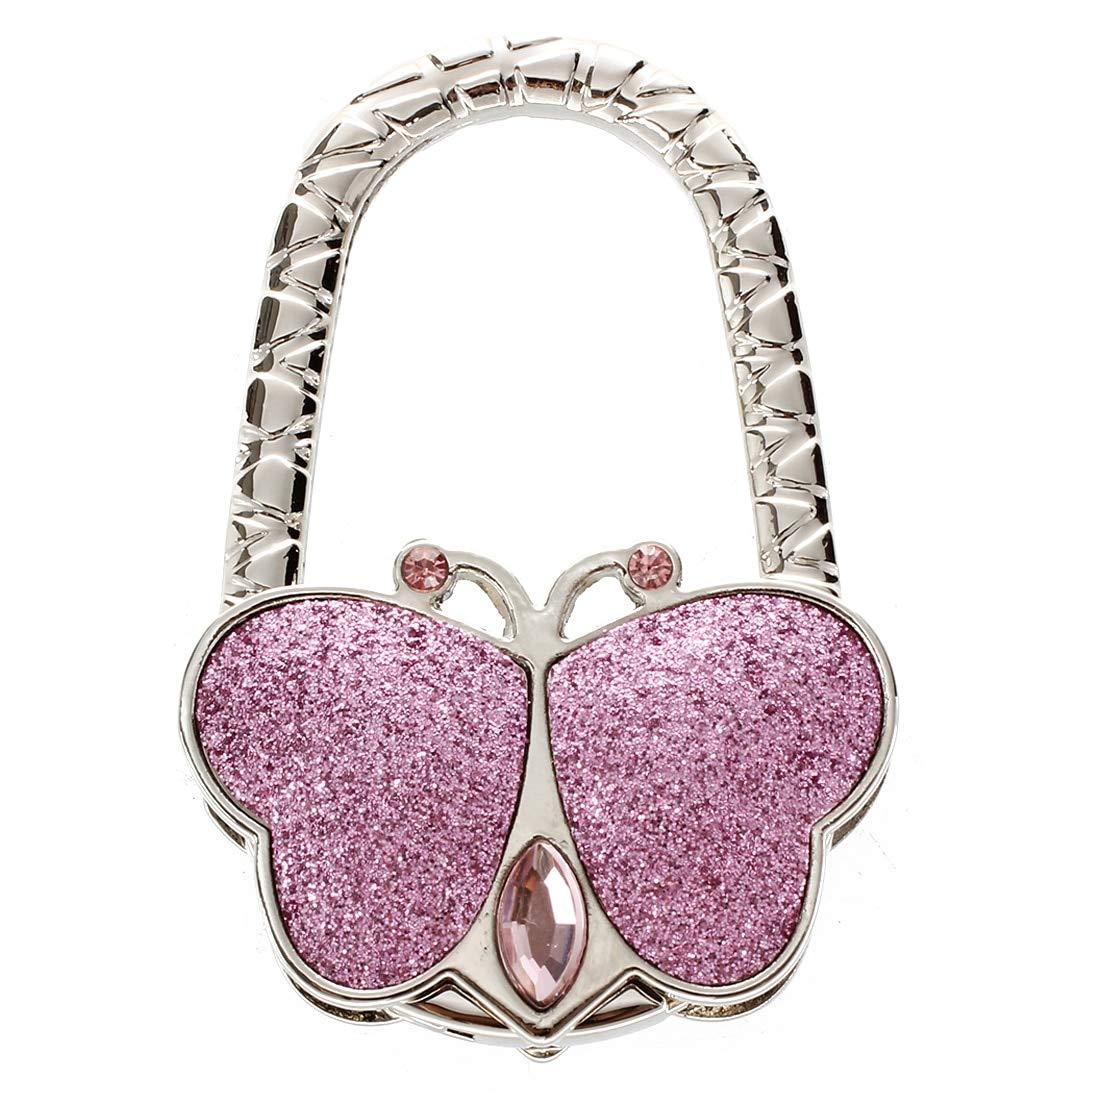 Bag Hook Bag Holder - Foldable Portable Handbag Hook - Butterfly Shaped Folding Handbag Hanger - Multiple Purse Shell Bag Hook Holder